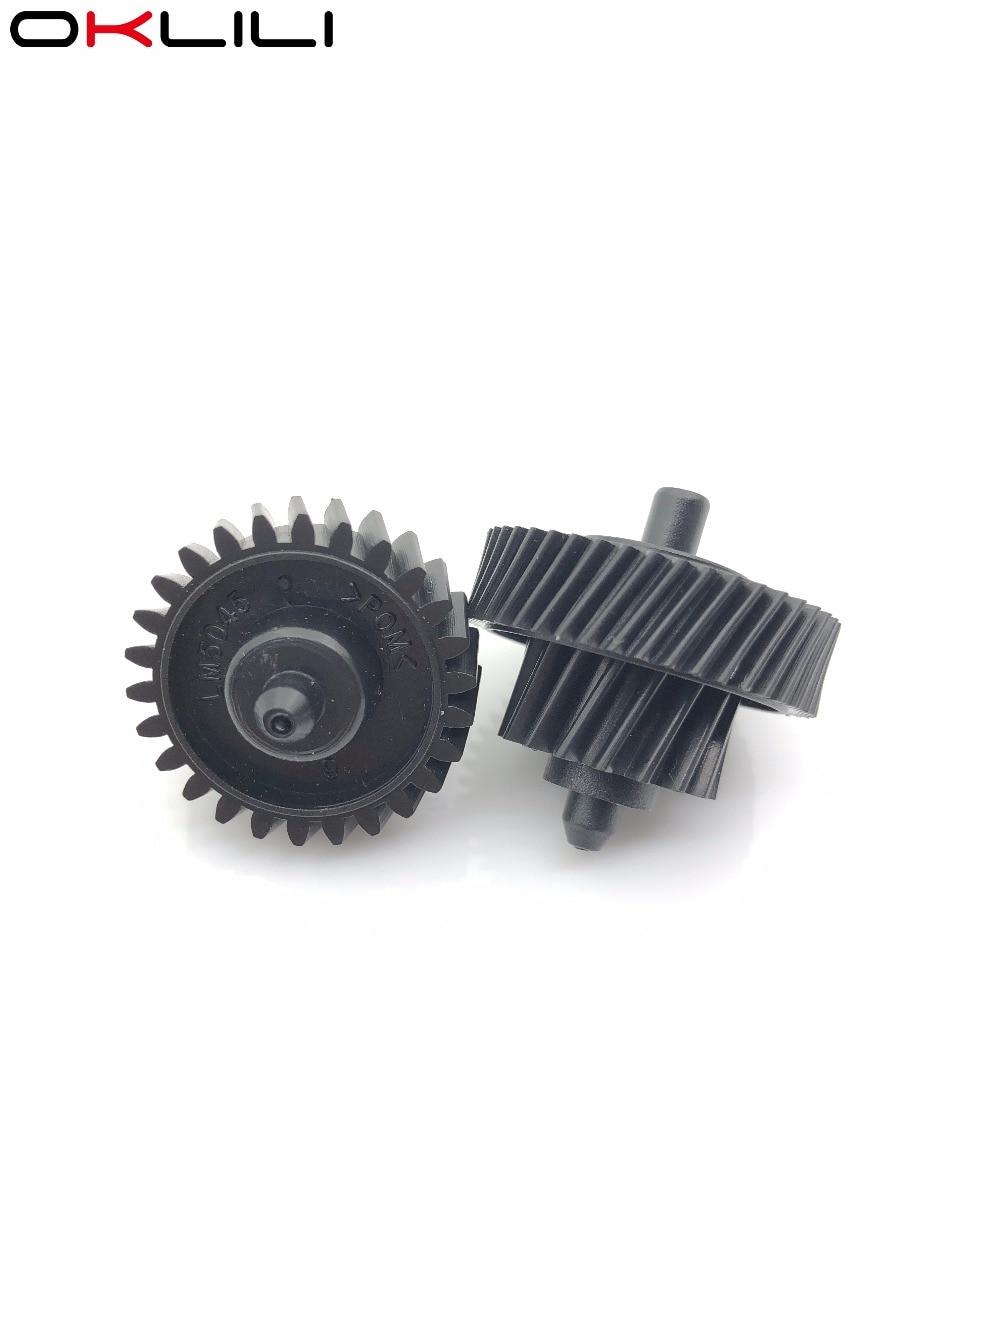 50X LU702000 engranaje kit para hermano DCP8060 DCP8065 DCP8070 DCP8080 DCP8085 HL5240 HL5250 HL5270 HL5280 HL5340 HL5350 HL5370-in Piezas de impresora from Ordenadores y oficina on AliExpress - 11.11_Double 11_Singles' Day 1